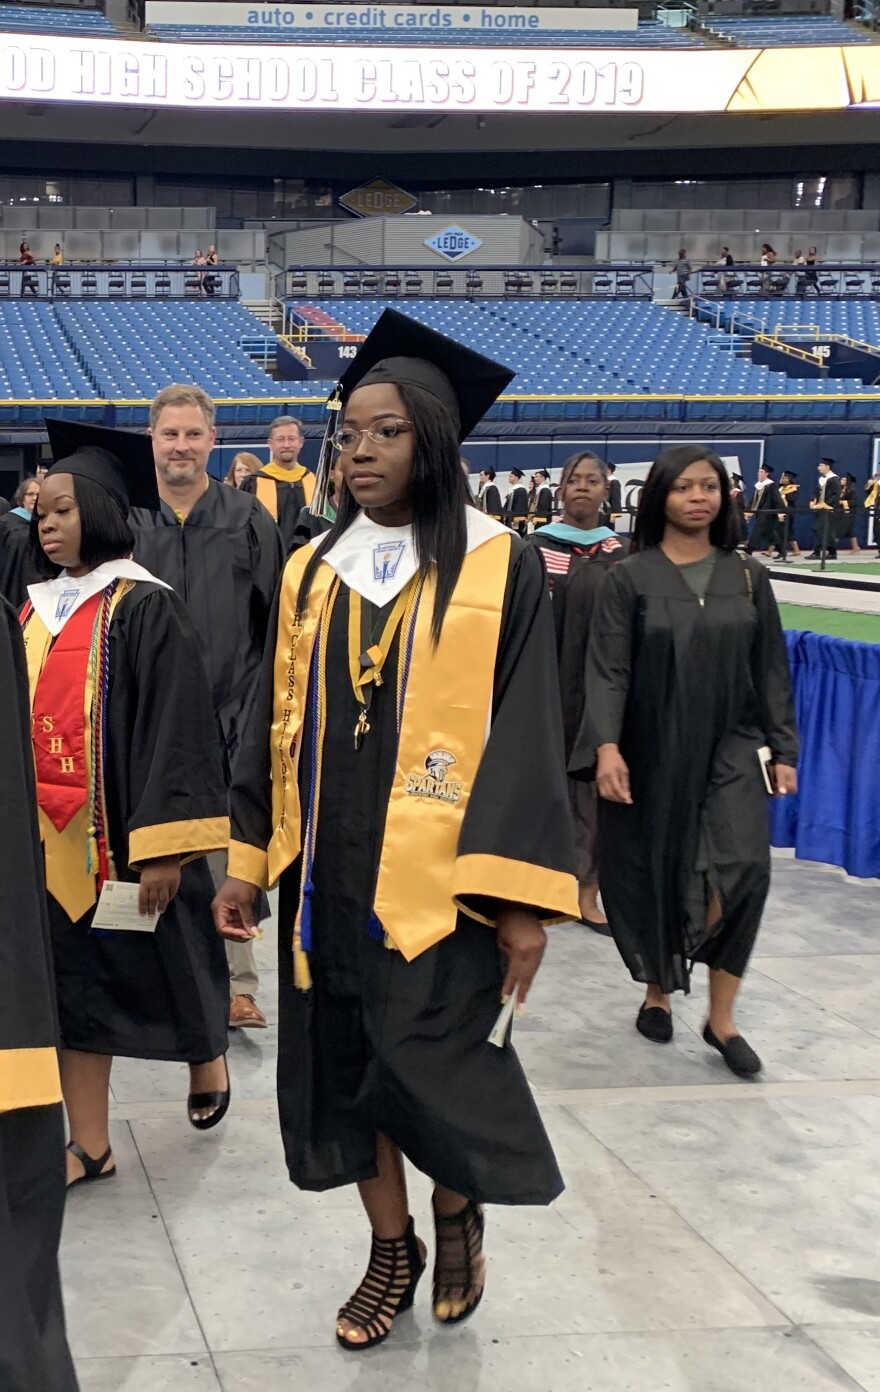 High school graduates walk to stage